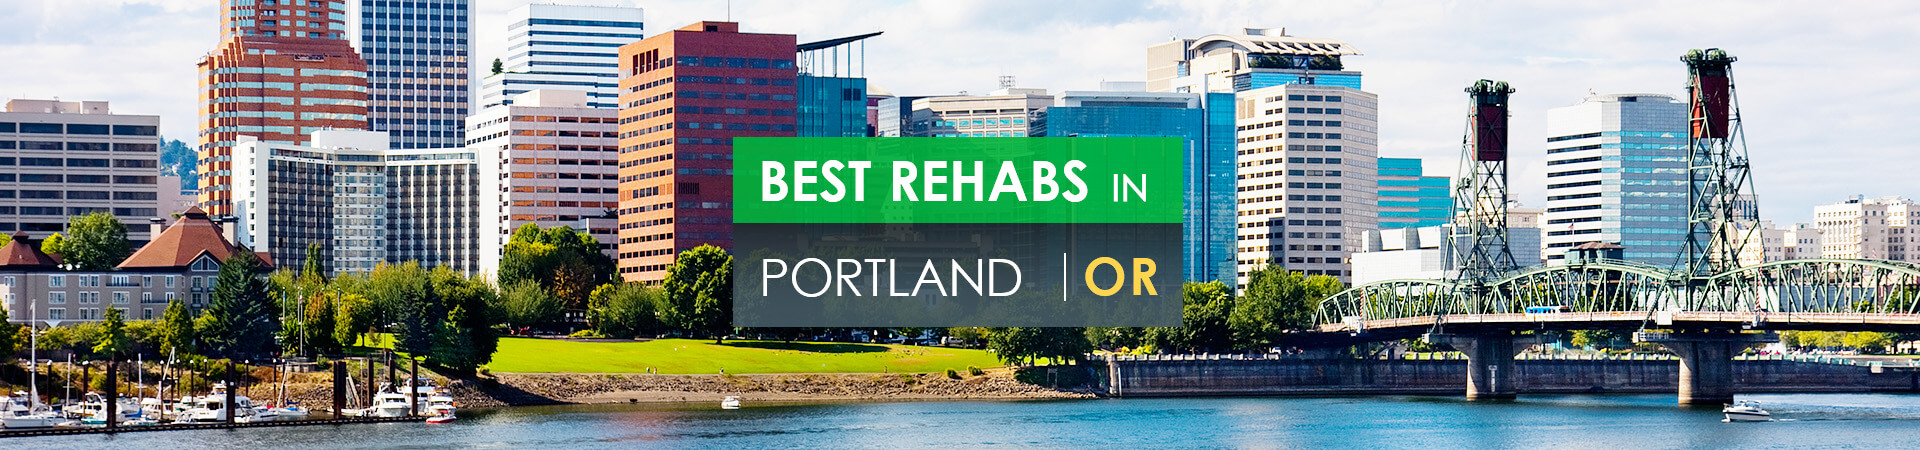 Best rehabs in Portland, OR